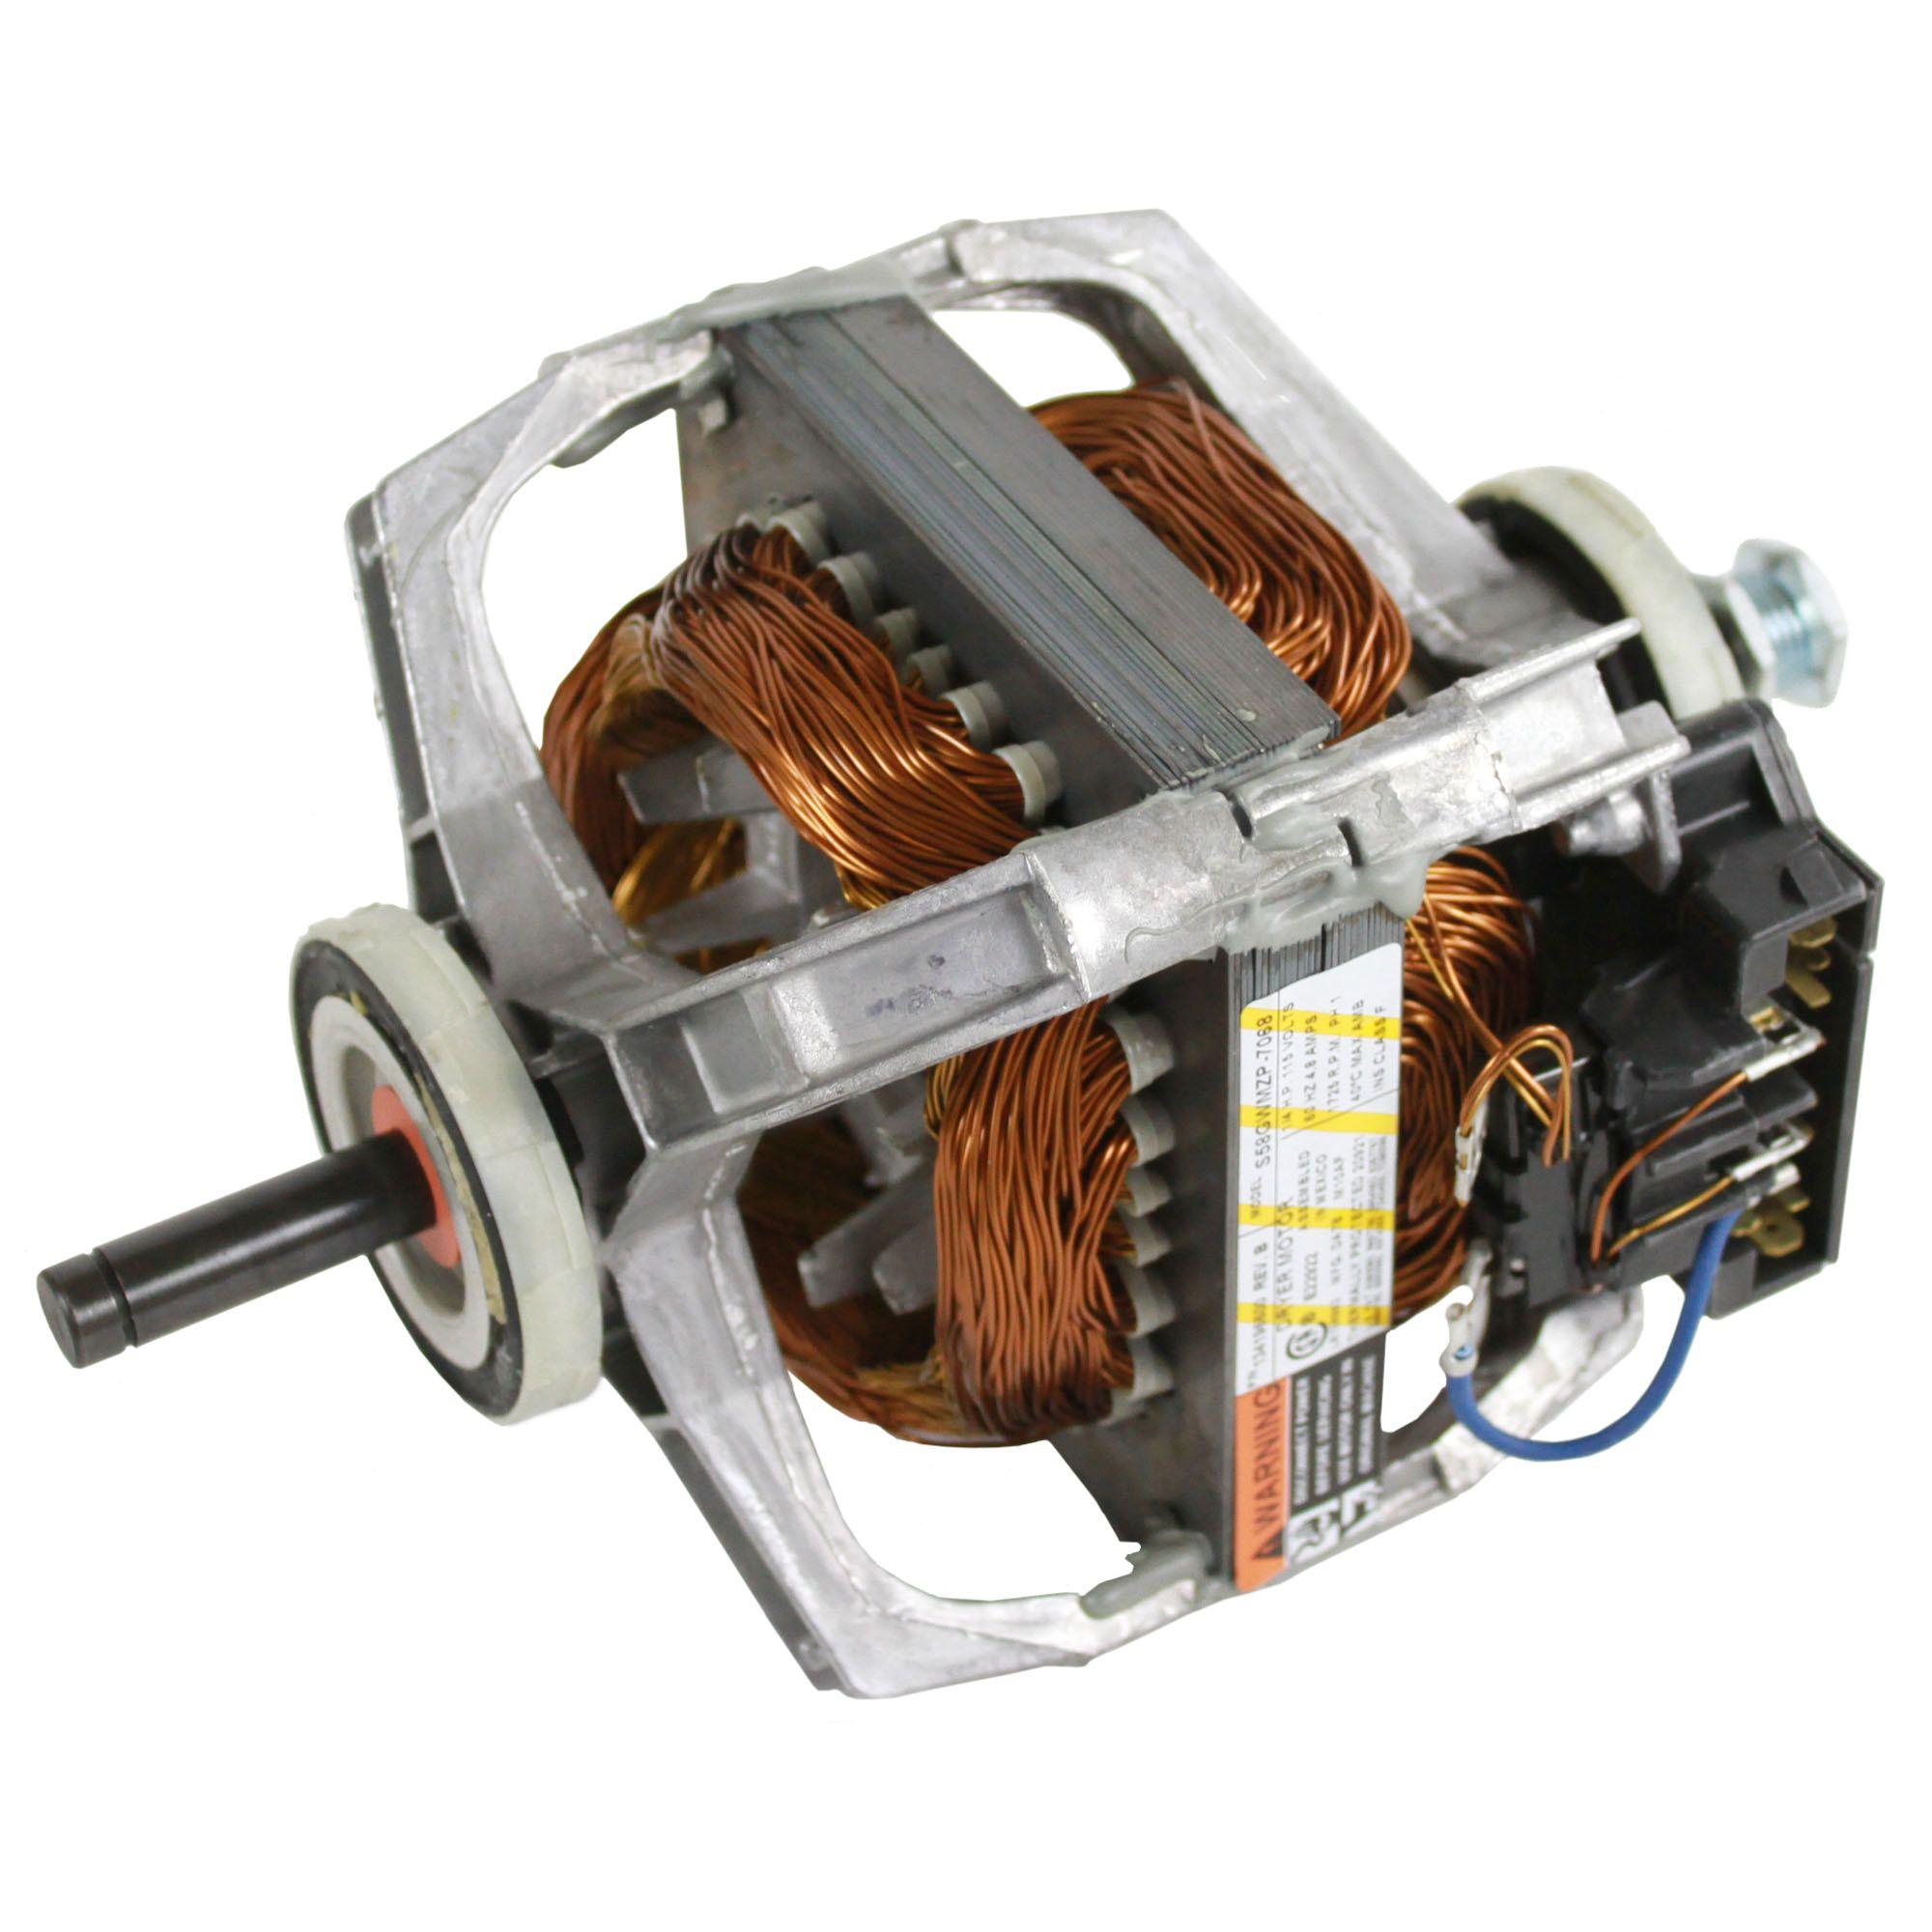 hight resolution of clothe dryer motor wiring diagram